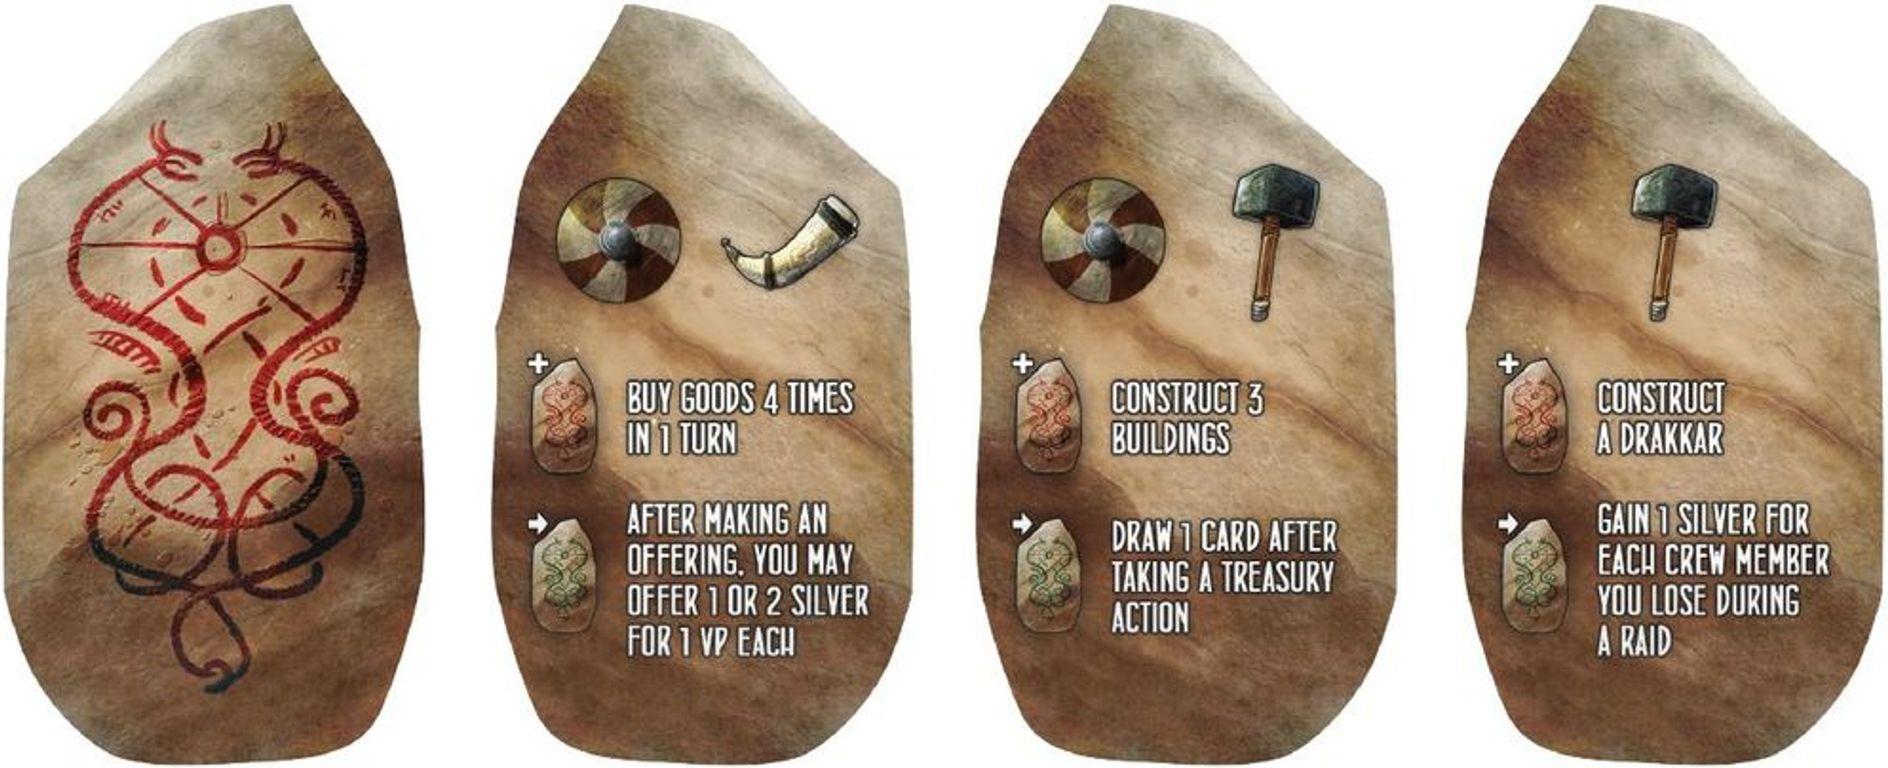 The North Sea Runesaga cards